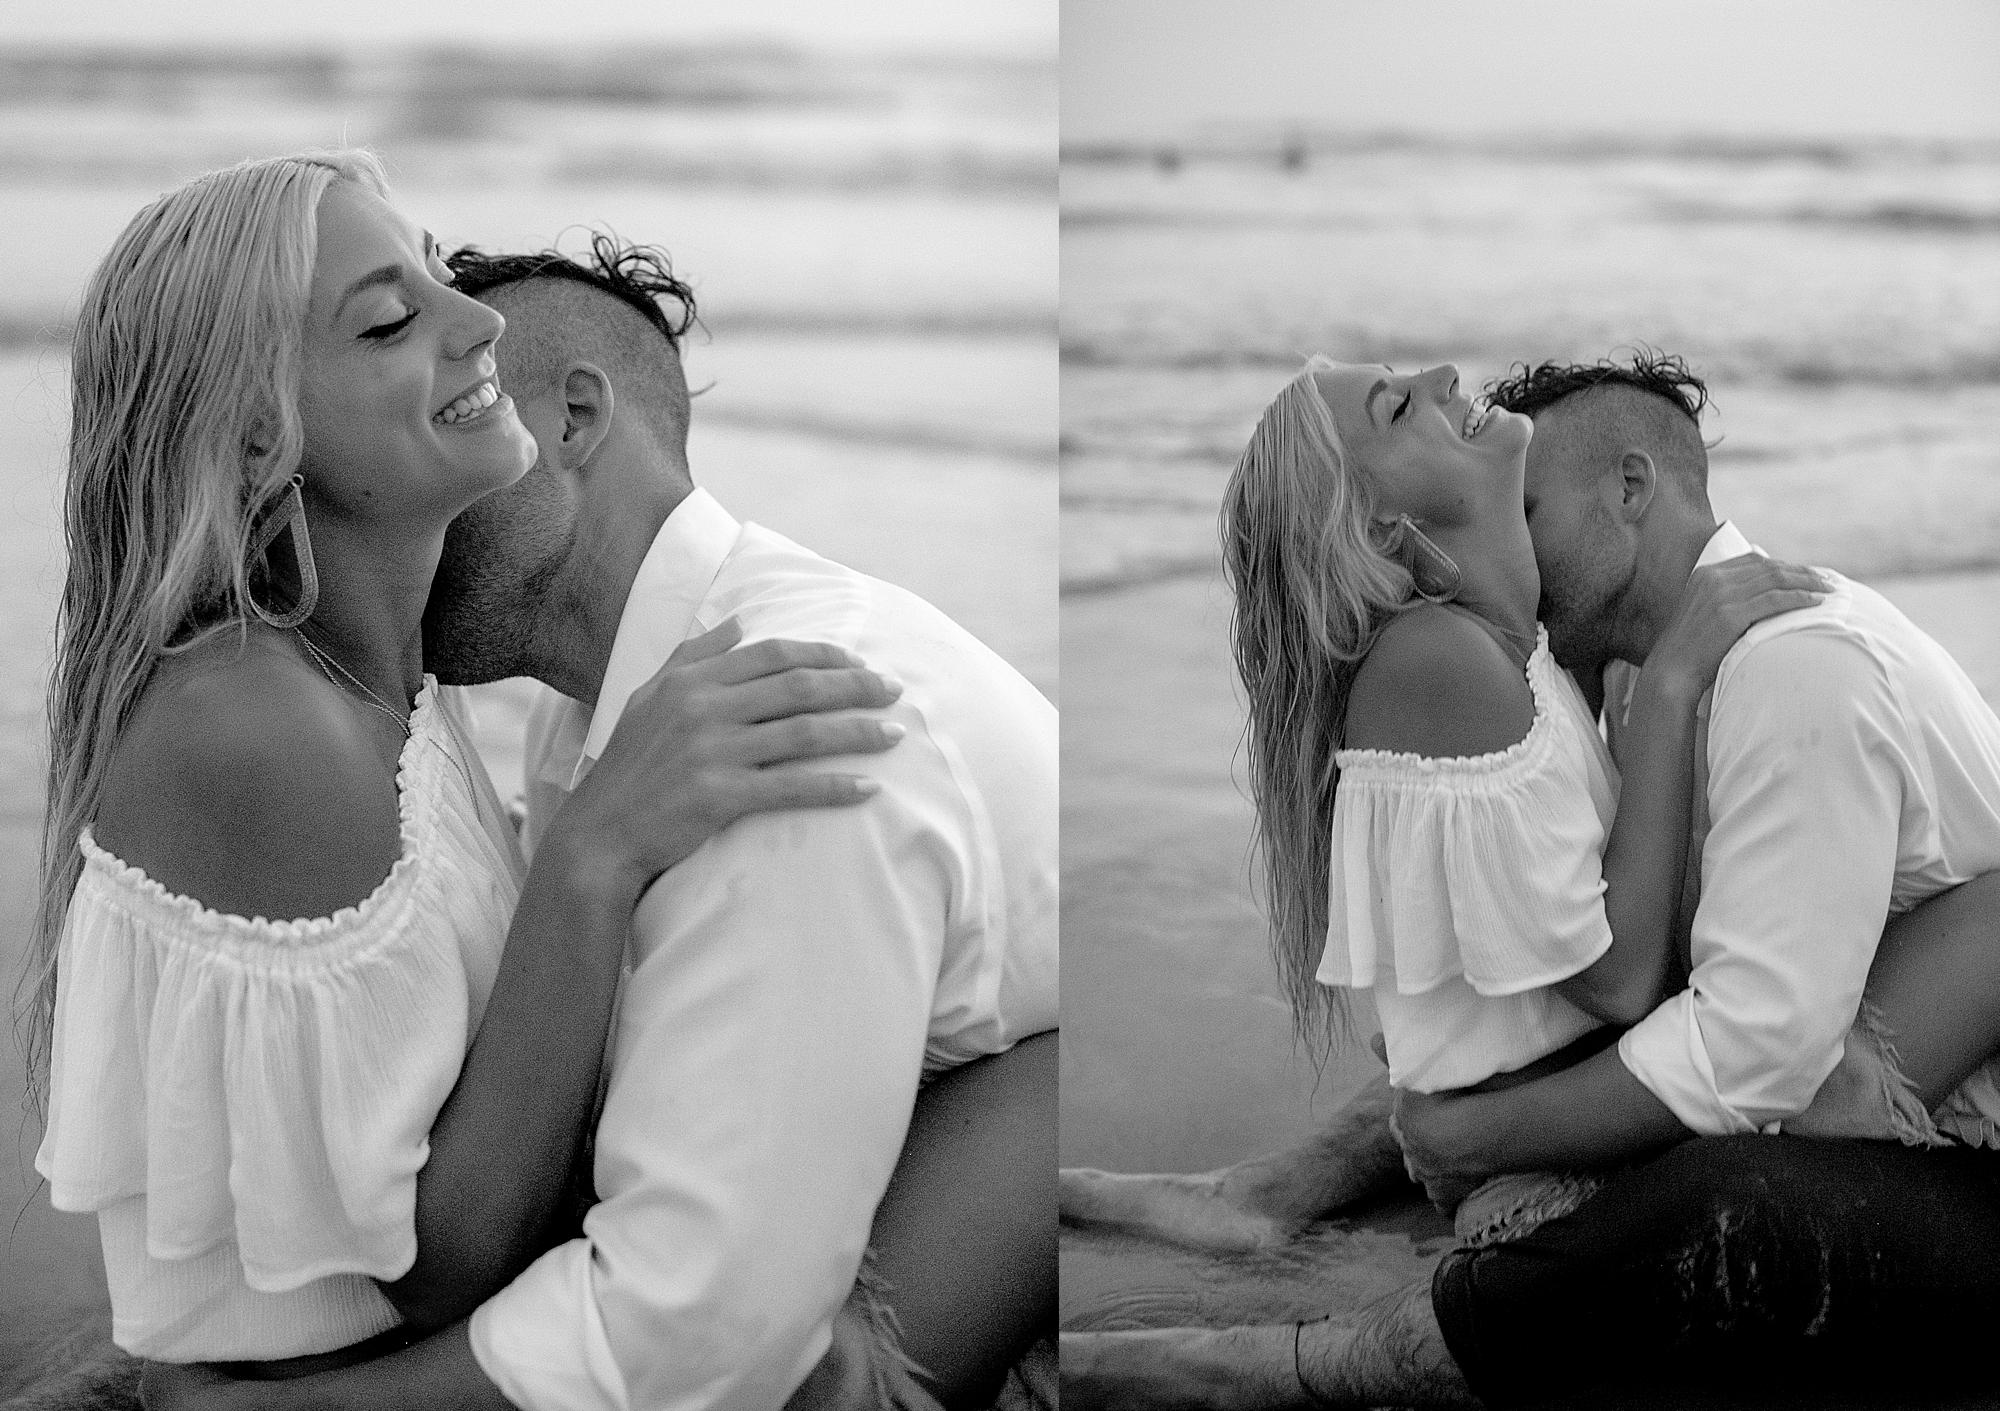 Epic and Adventurous Travel Wedding and Portrait Photographer in Nosara, Costa Rica - Kelee Bovelle @xokelee @keleeb - 34.jpg